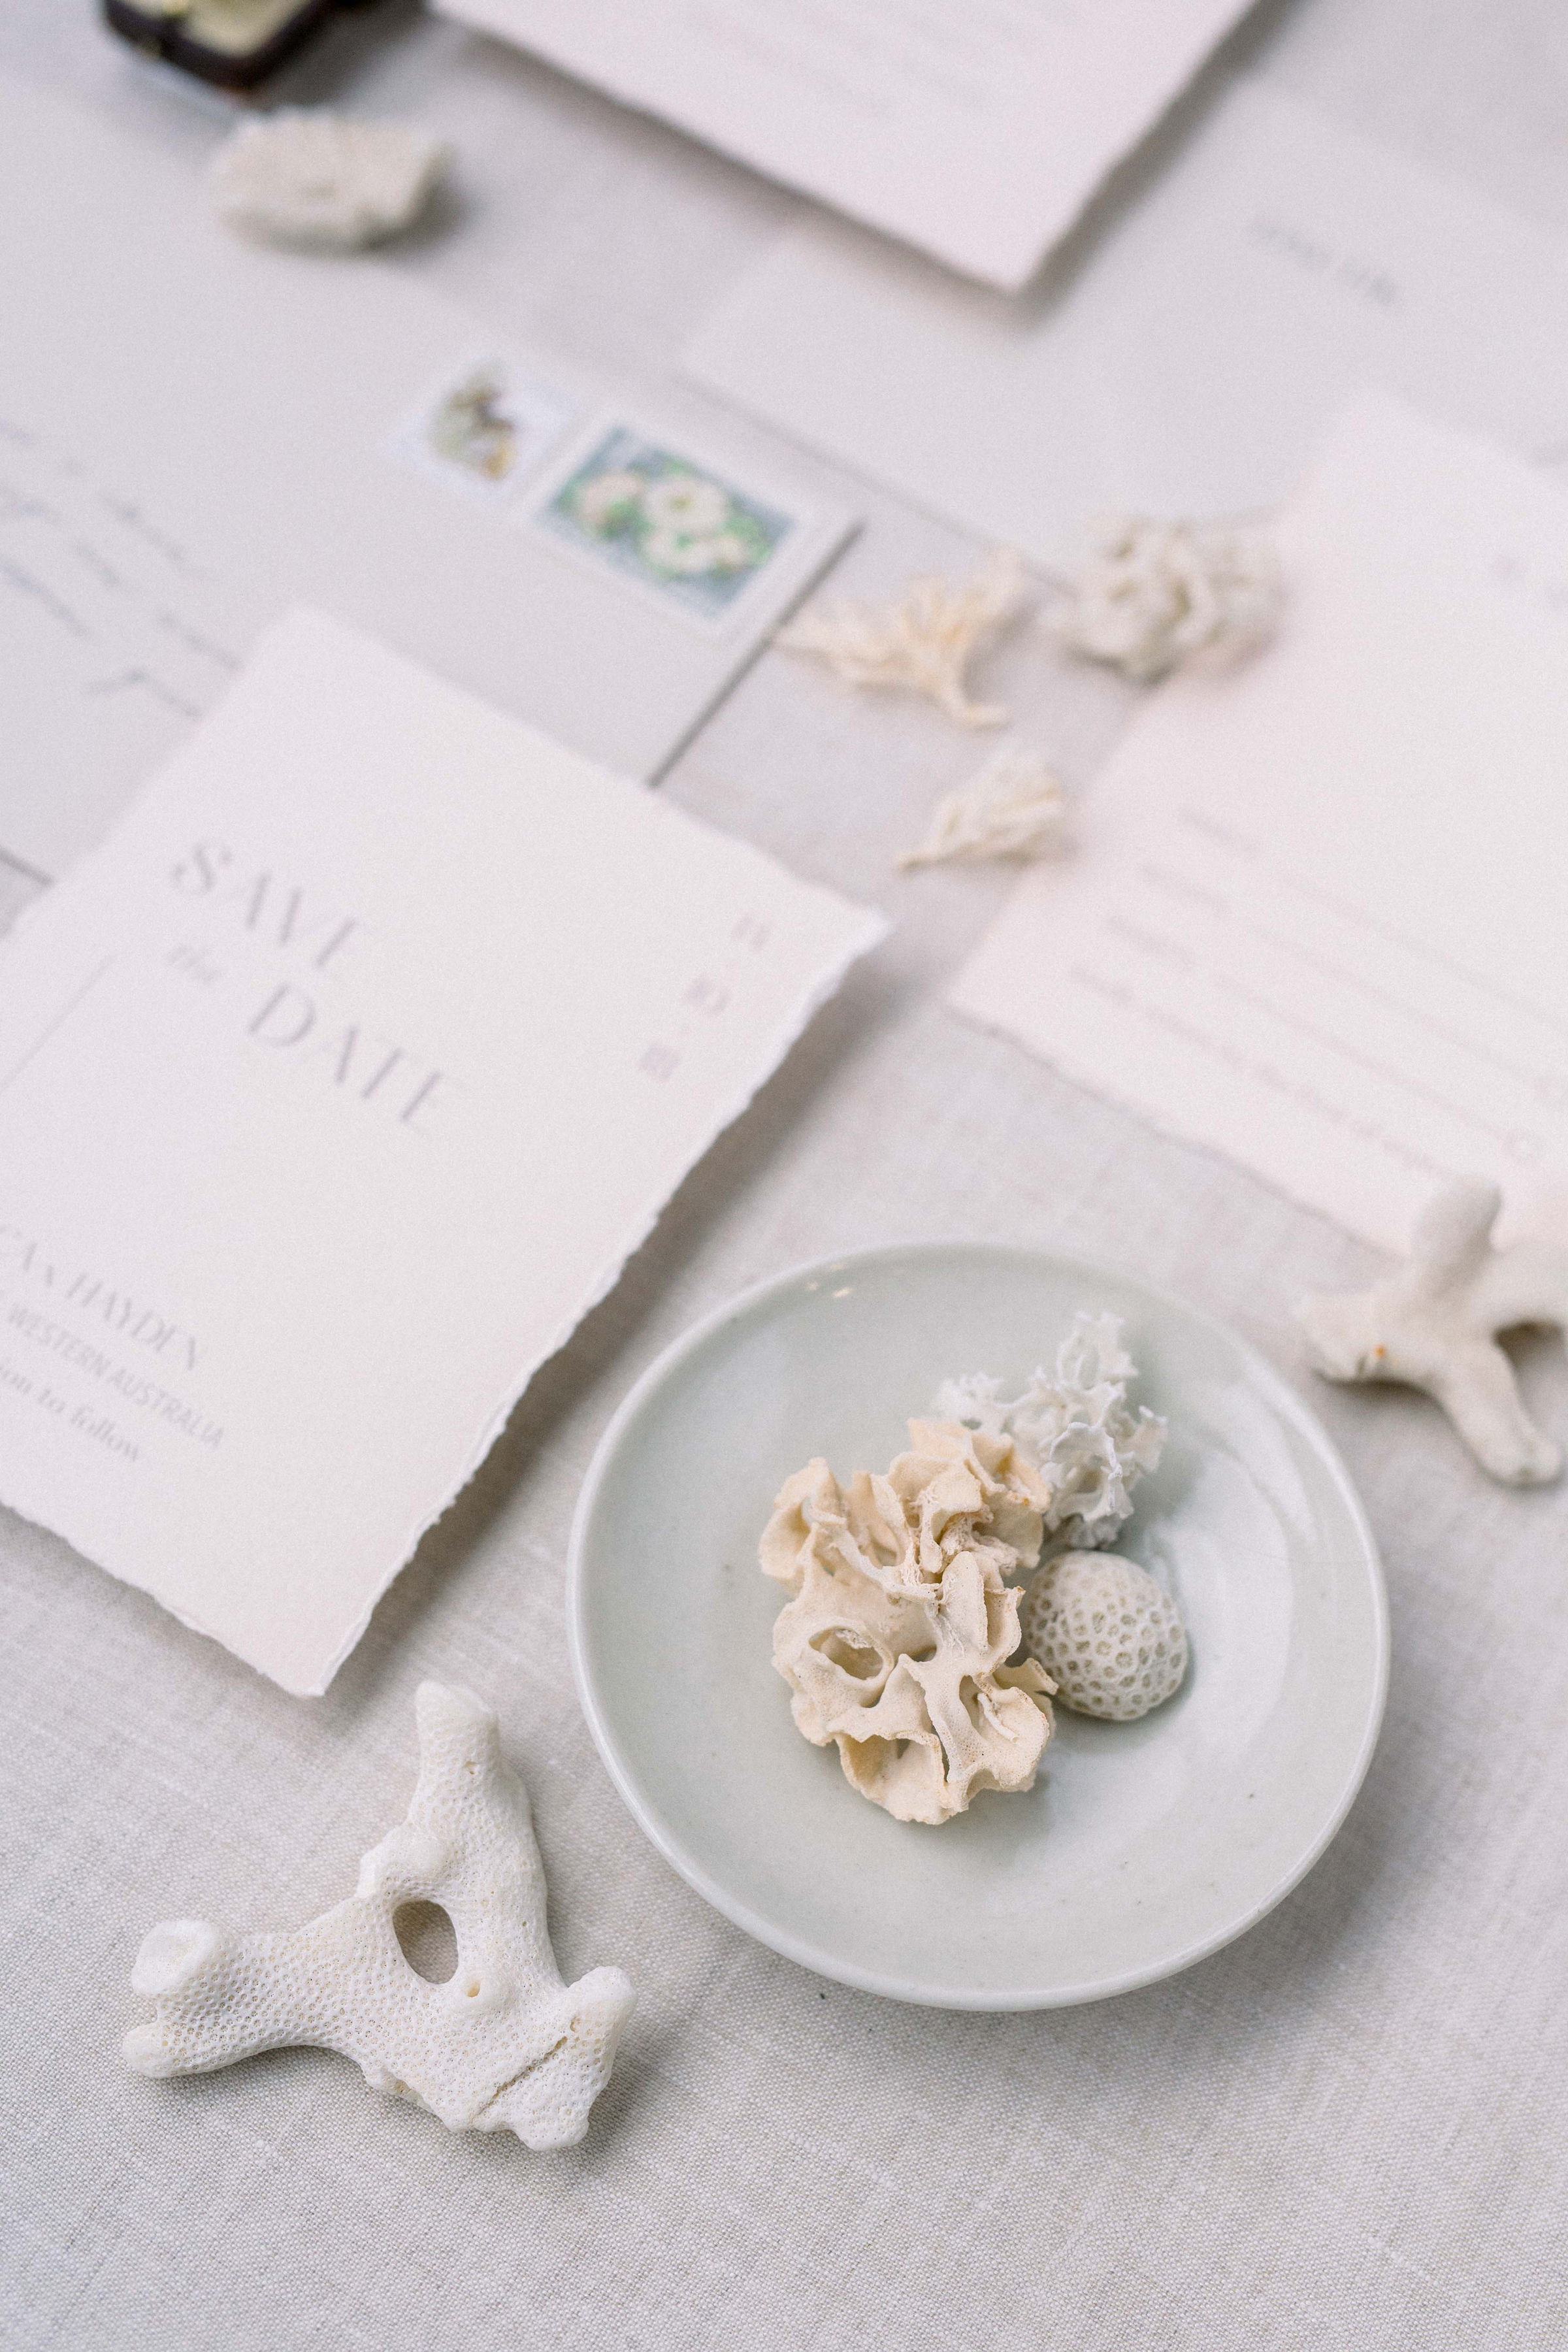 FremantleWeddingWalk-BlueHQ-WeddingStationary-TessaKitPhotography-JQ9A8359.jpg